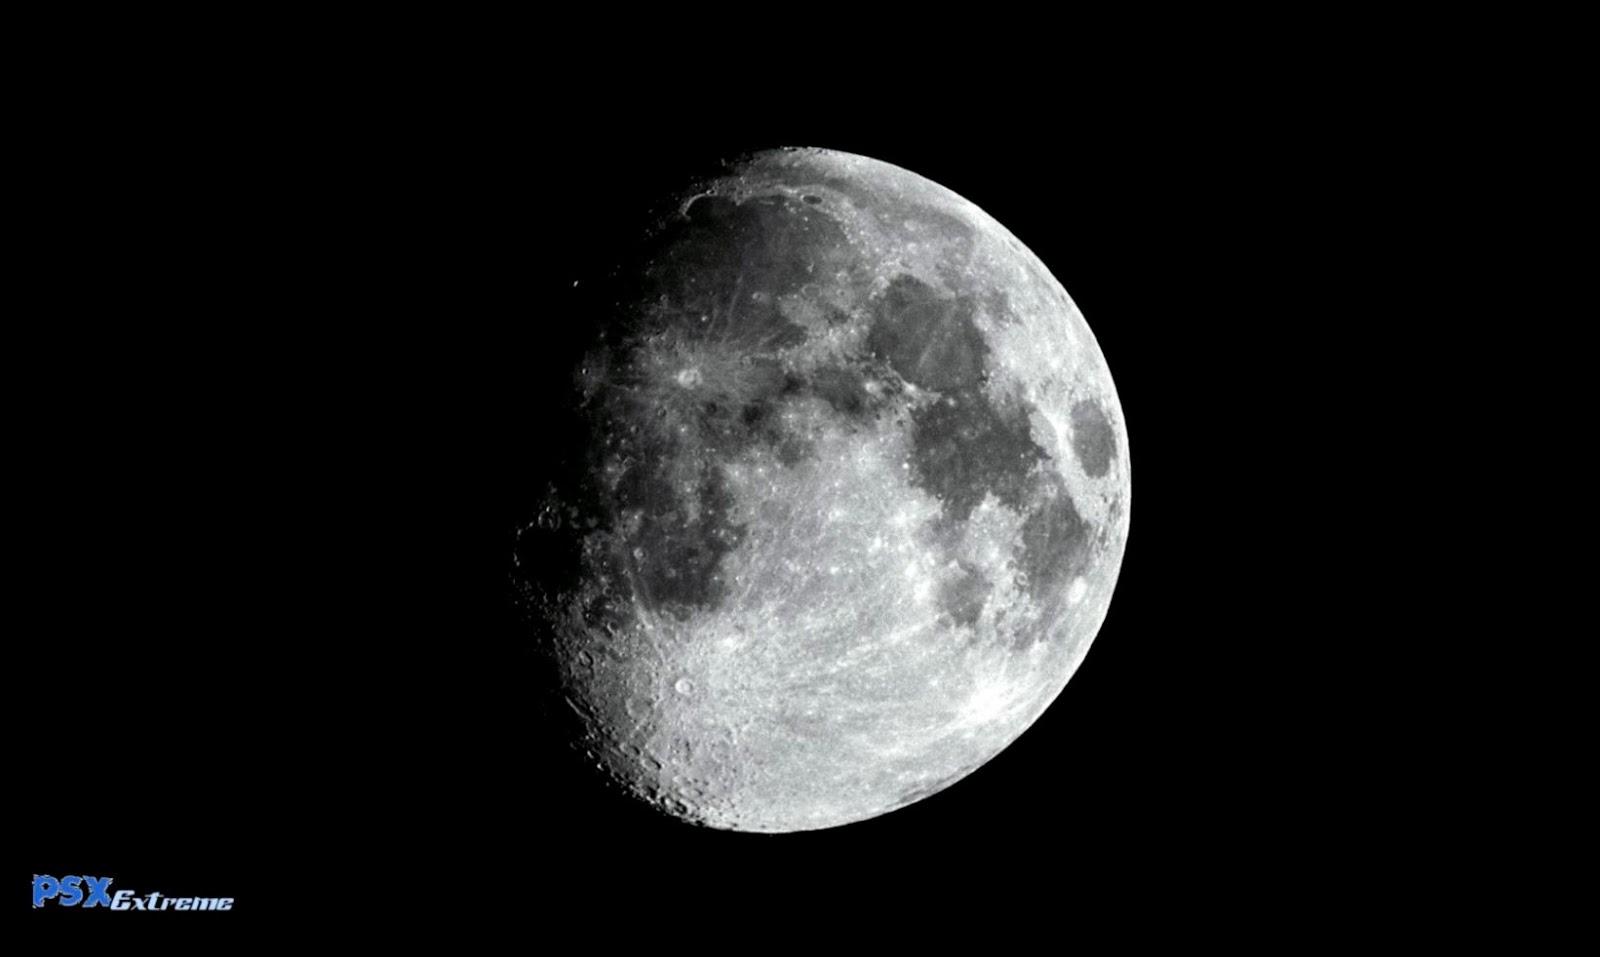 astronaut moon hd pics - photo #23